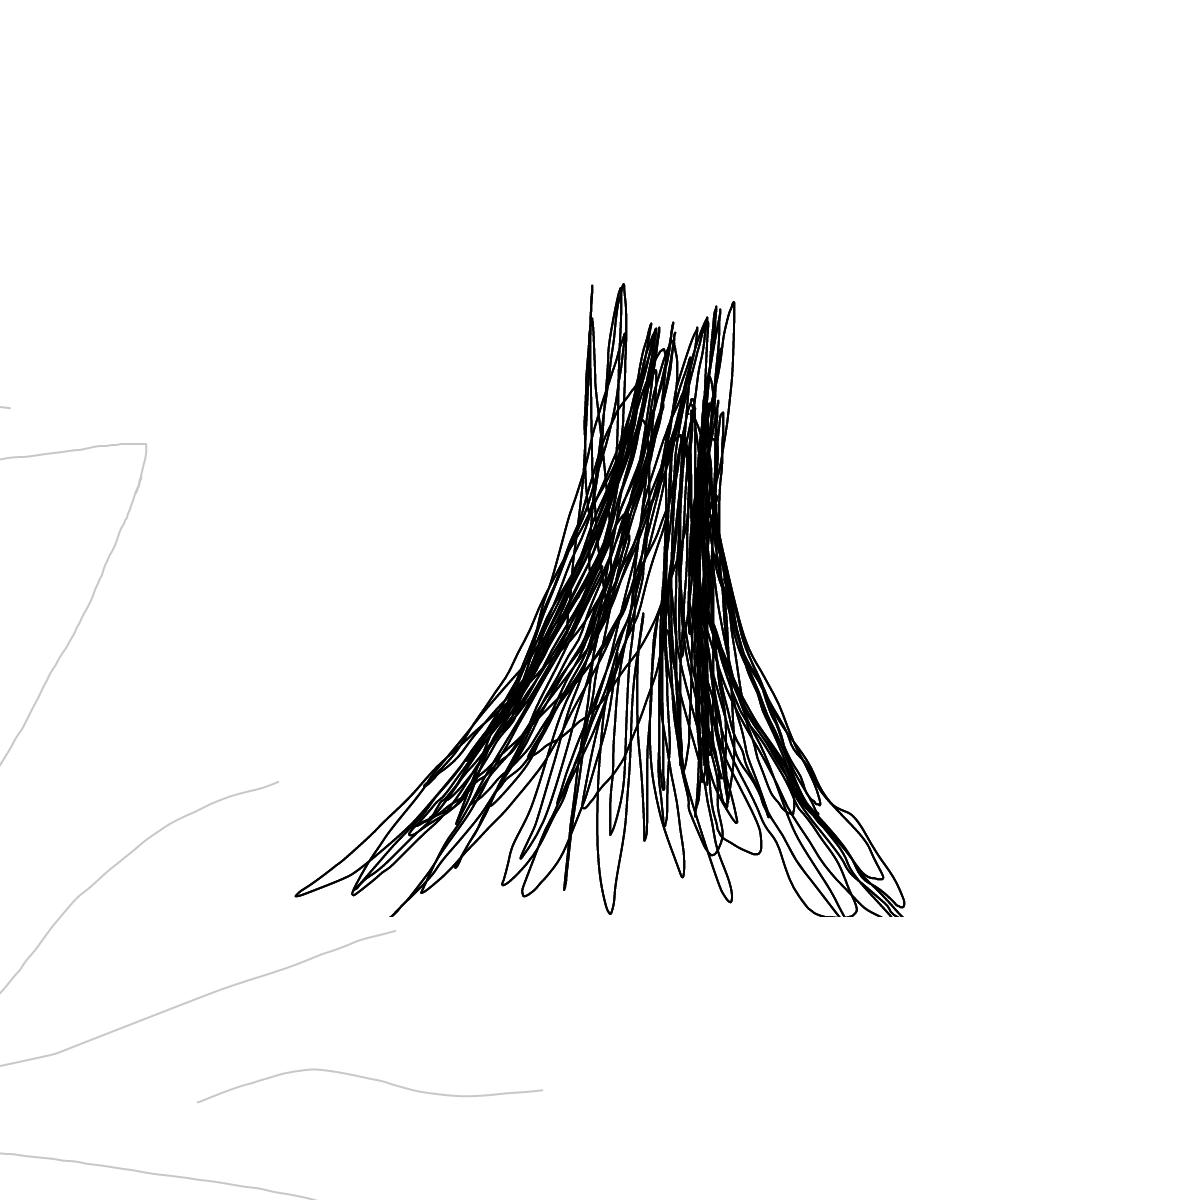 BAAAM drawing#16952 lat:51.2066802978515600lng: 3.2592937946319580